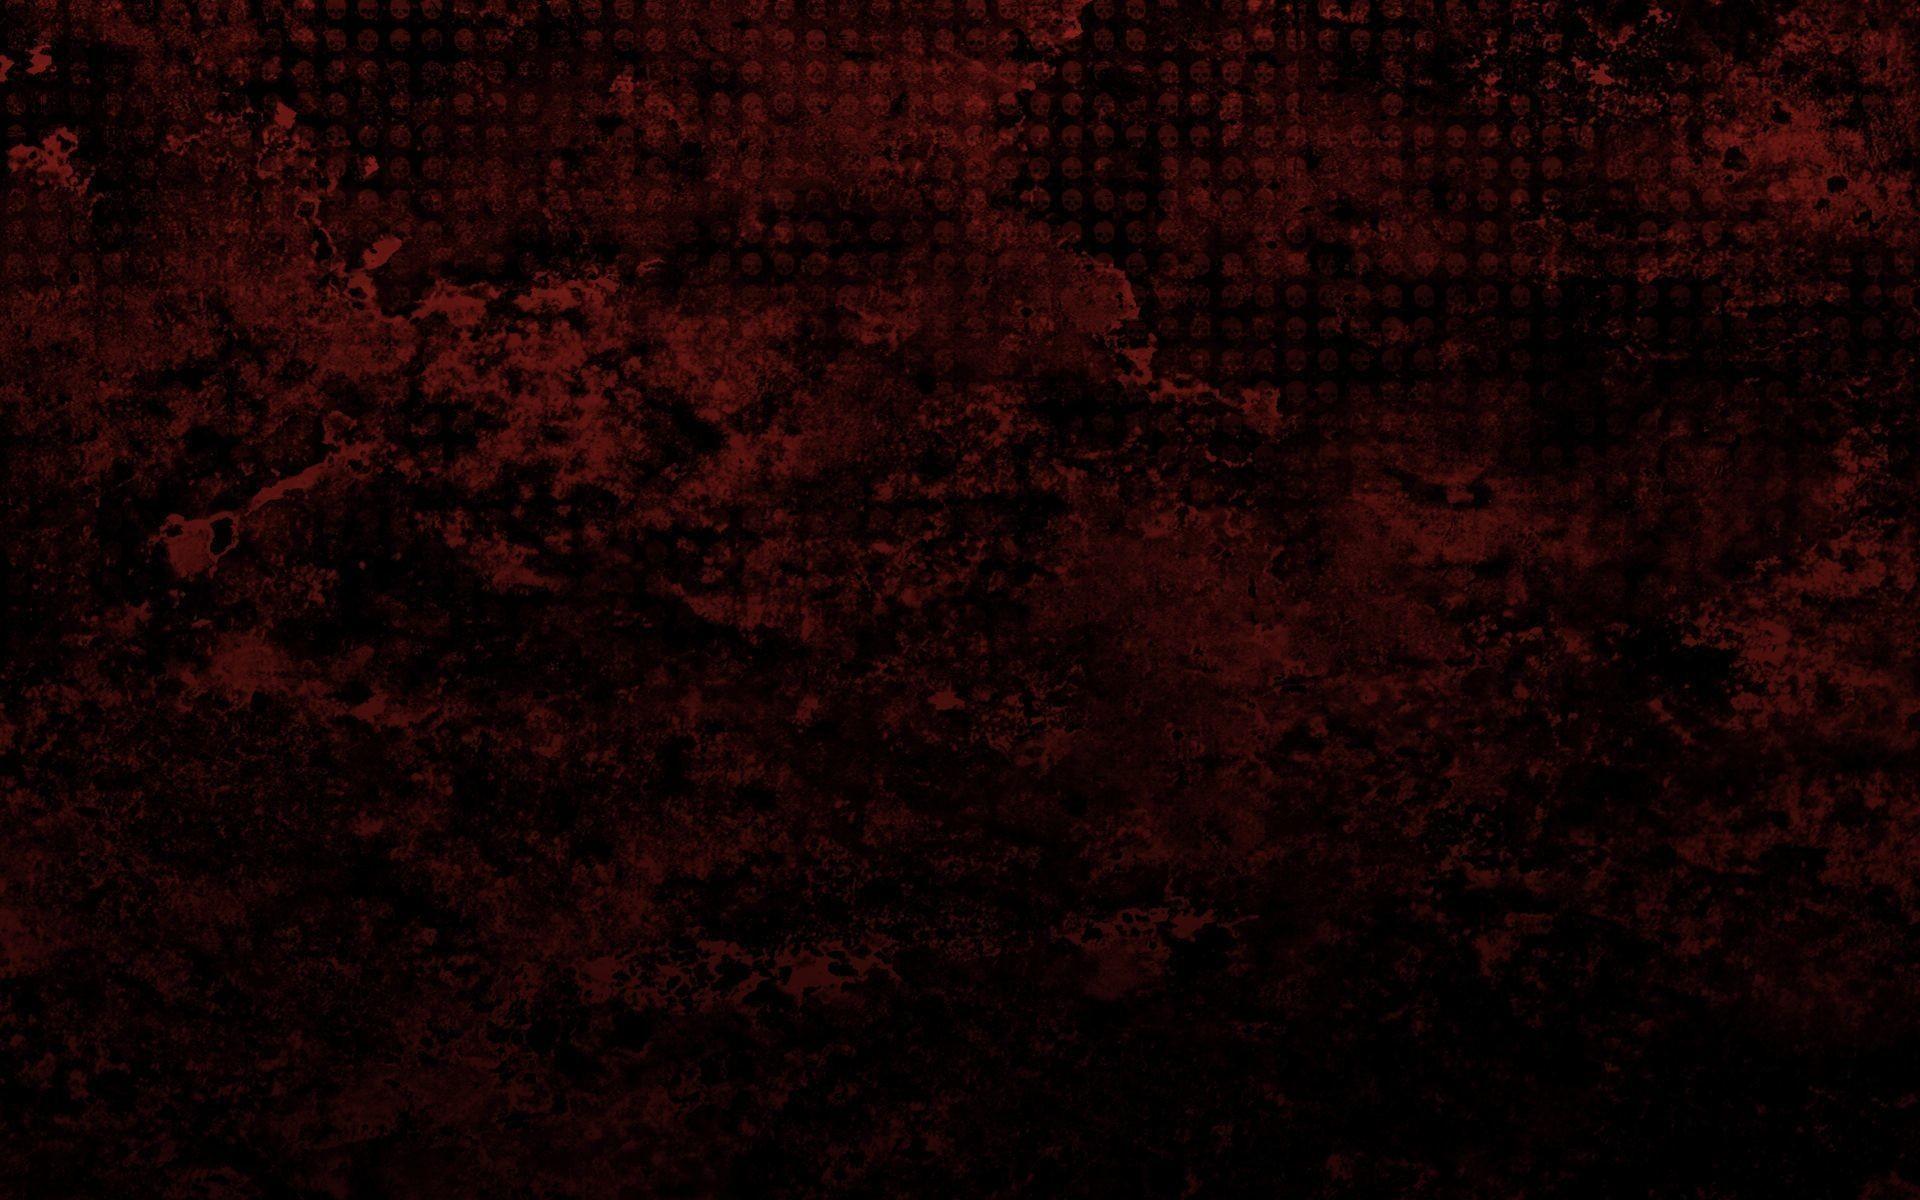 Skull pattern on a red grunge Wallpaper 28537